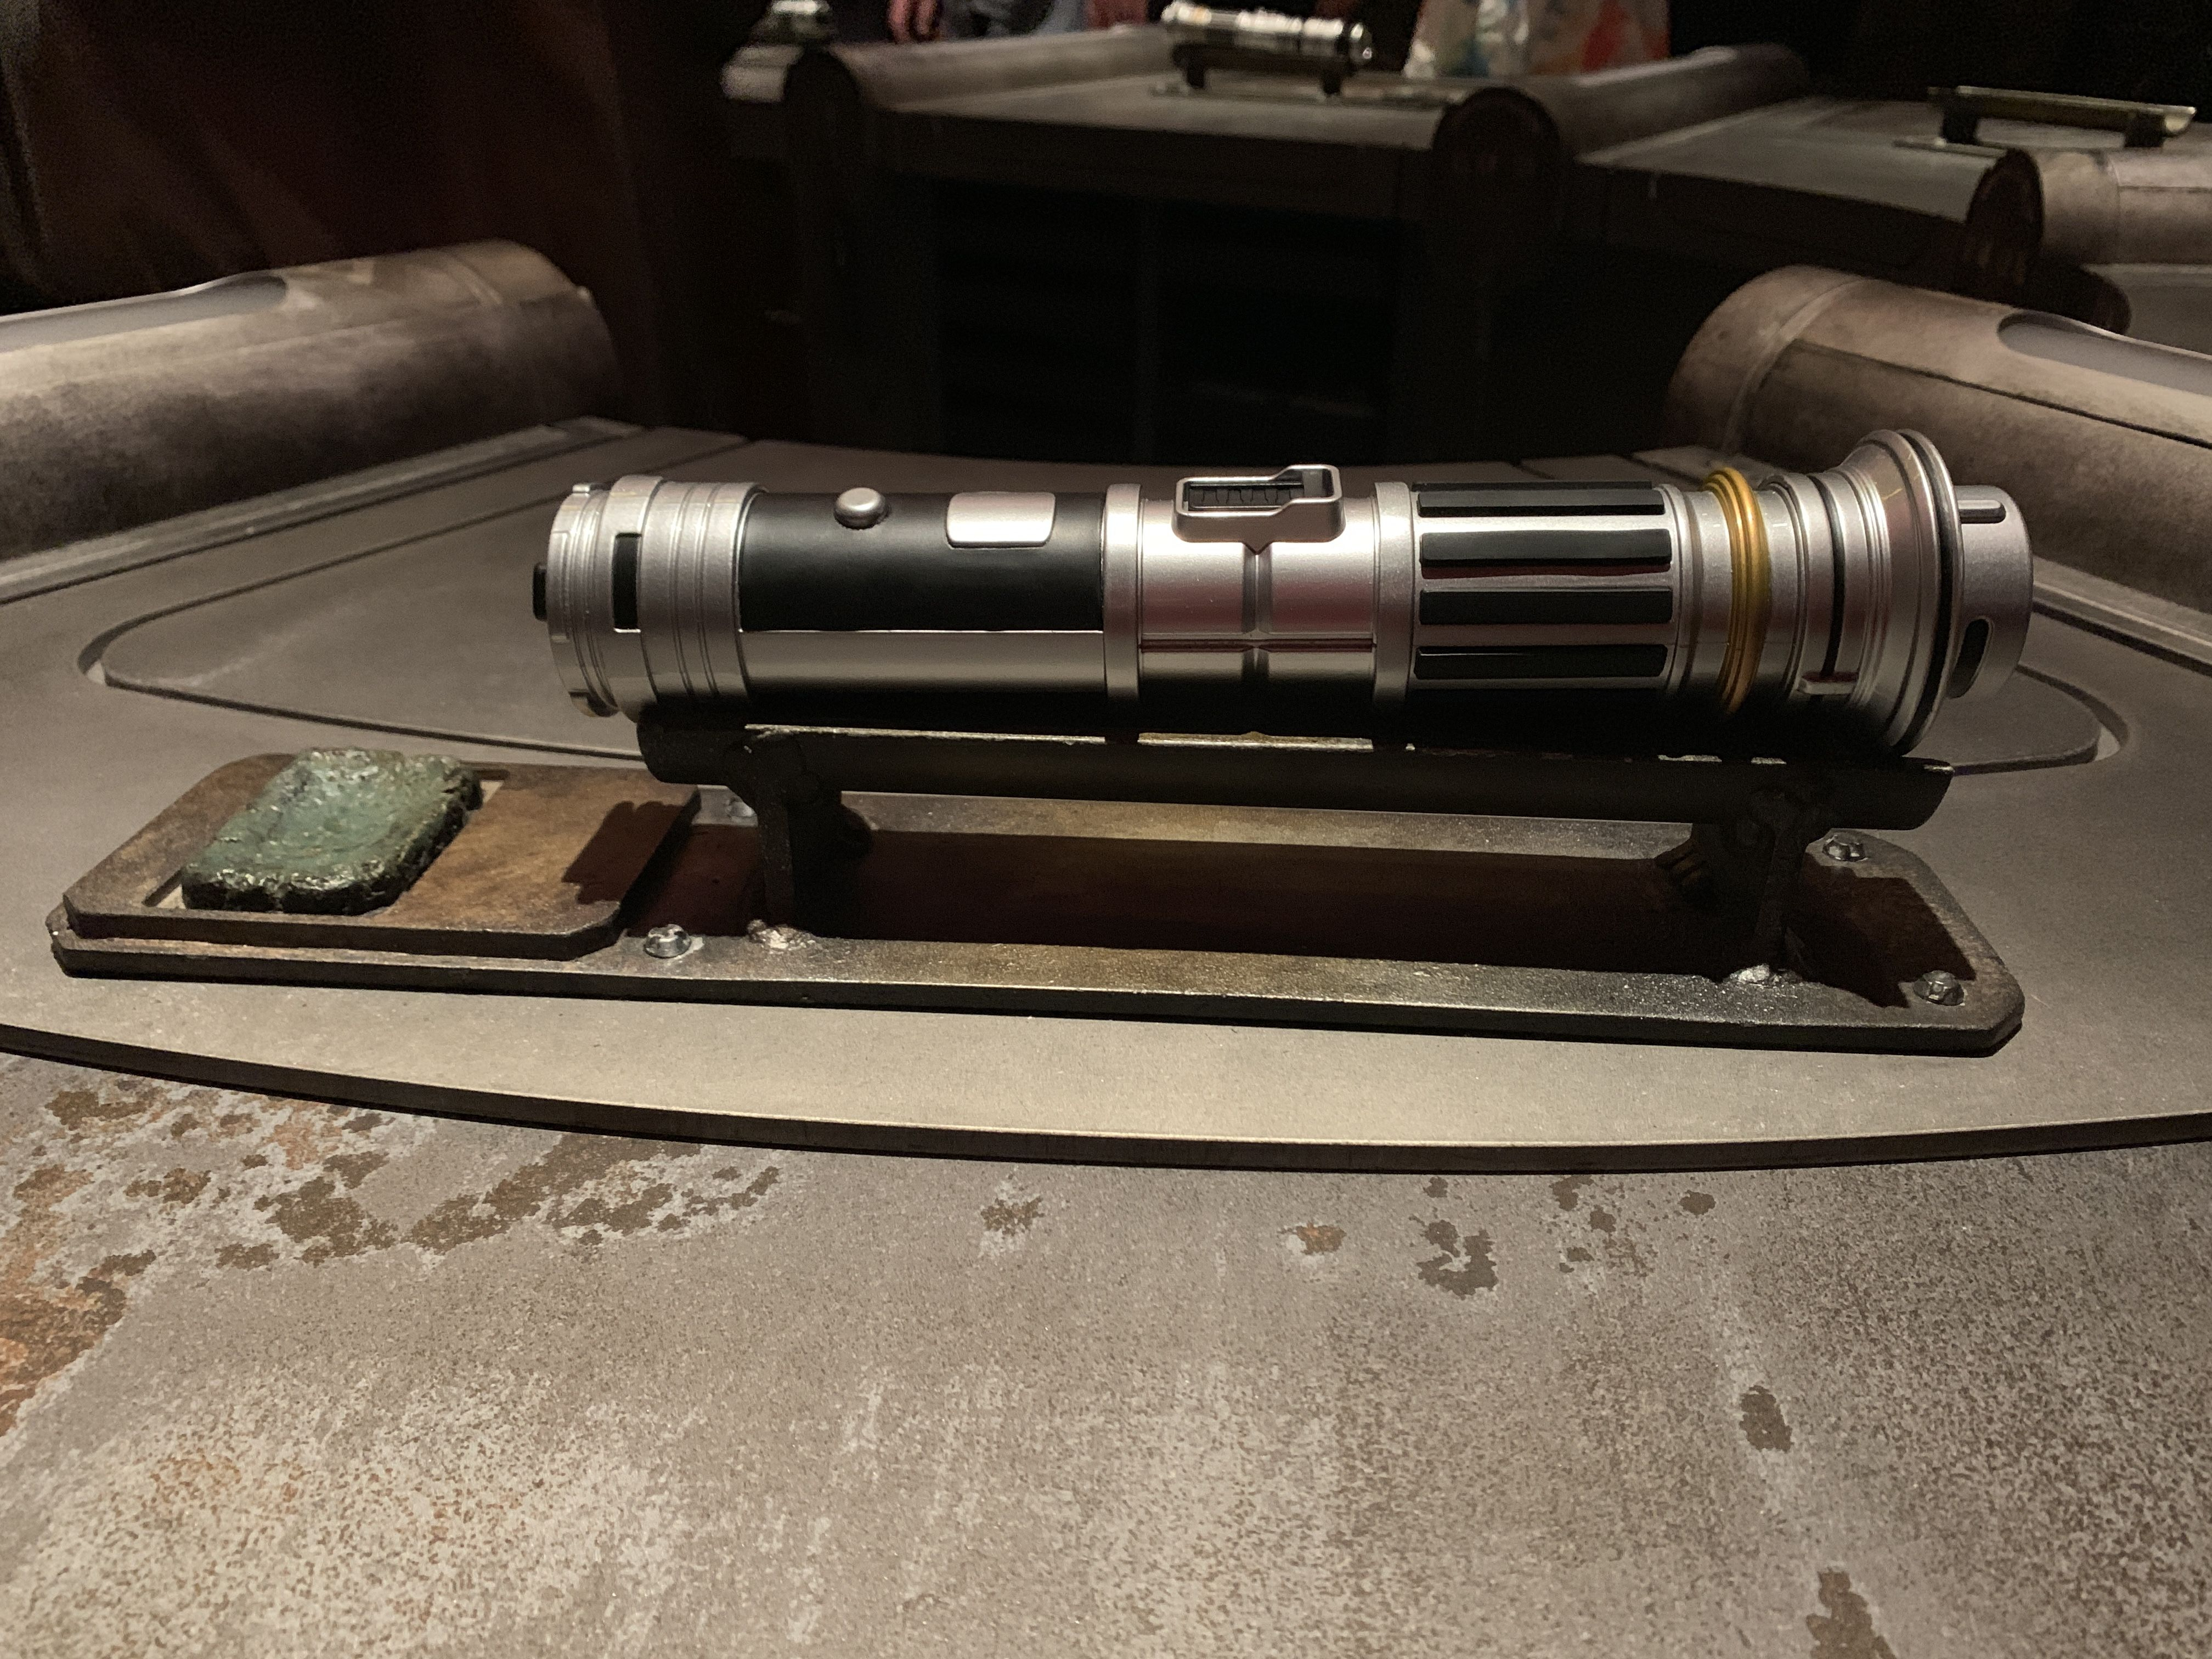 Peace Justice Lightsaber Star Wars Cool Stuff